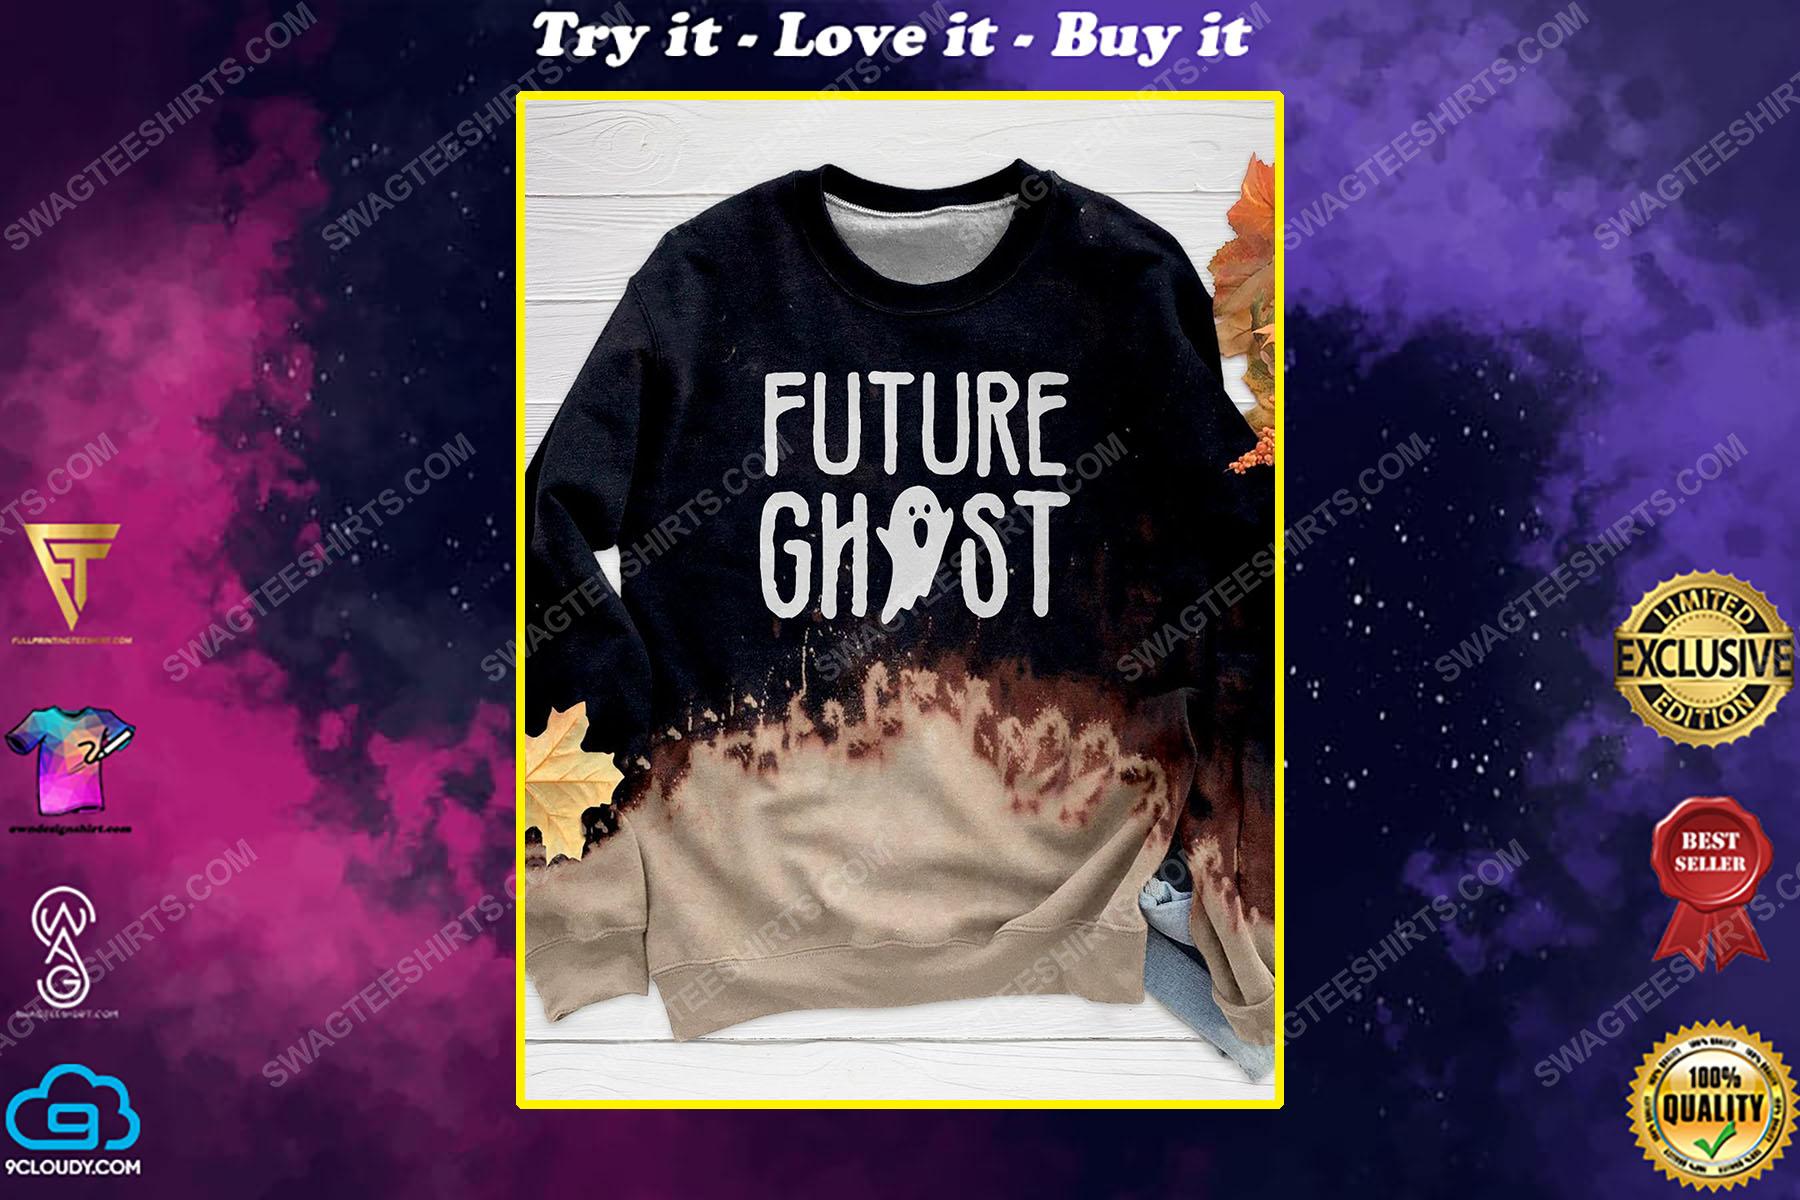 Halloween night and furture ghost full print shirt